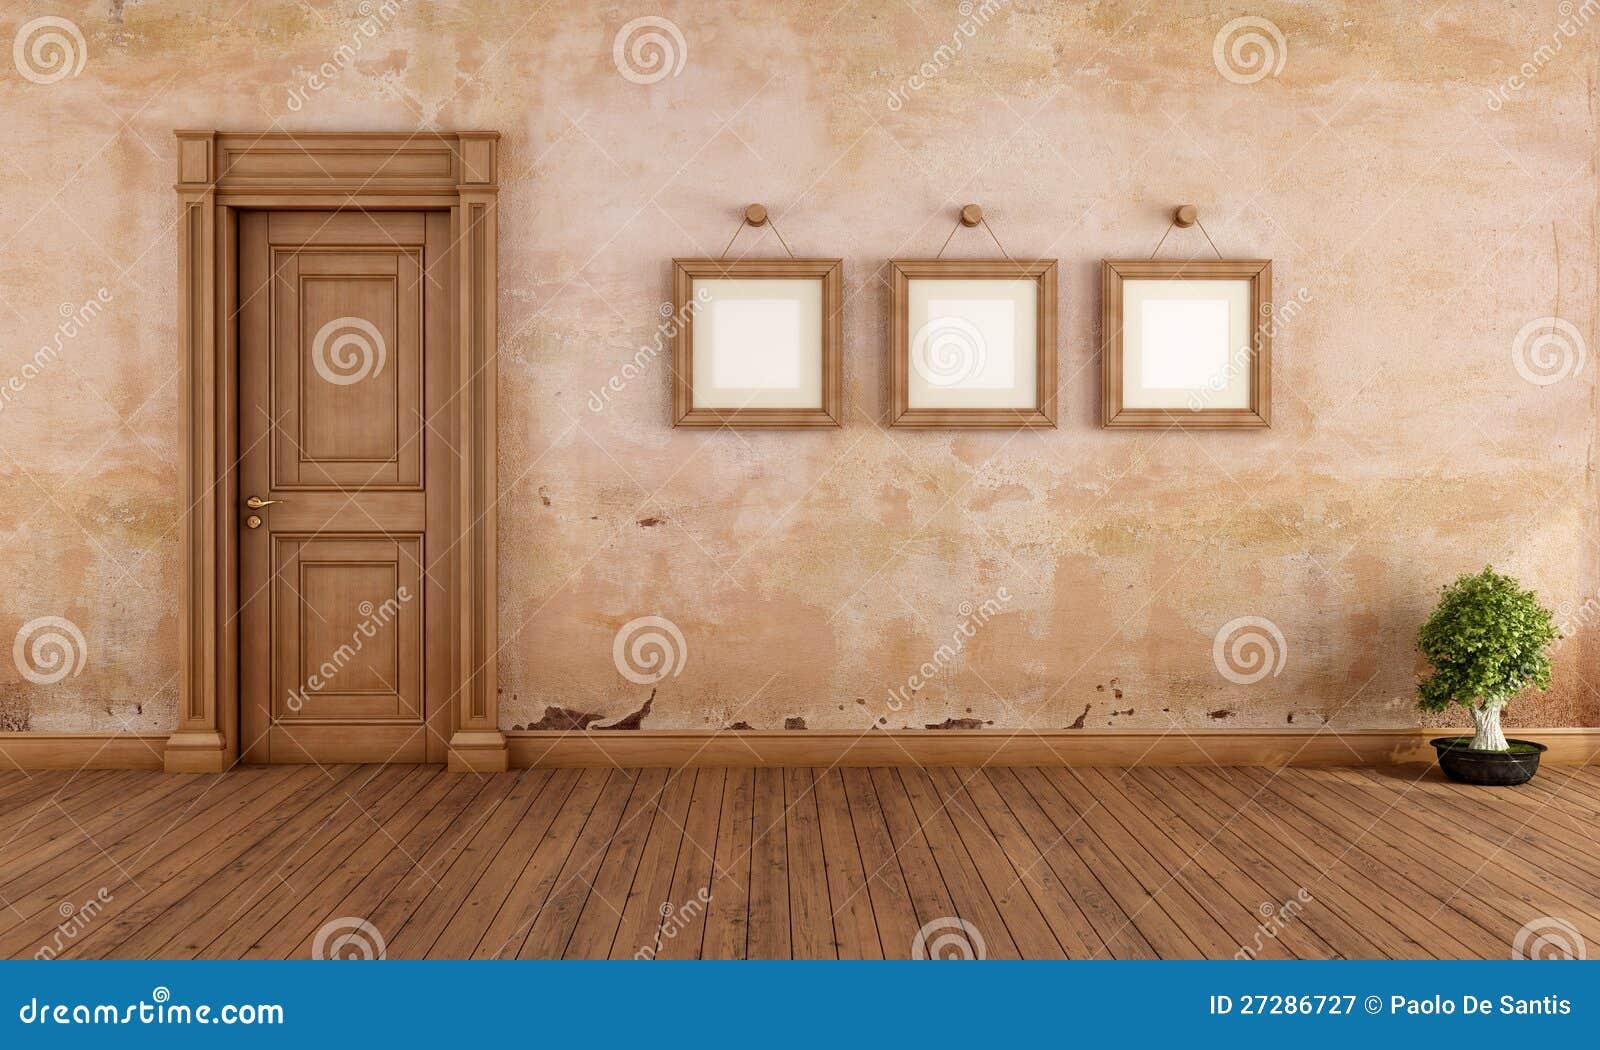 Empty vintage interior with wooden door stock illustration empty vintage interior with wooden door planetlyrics Gallery